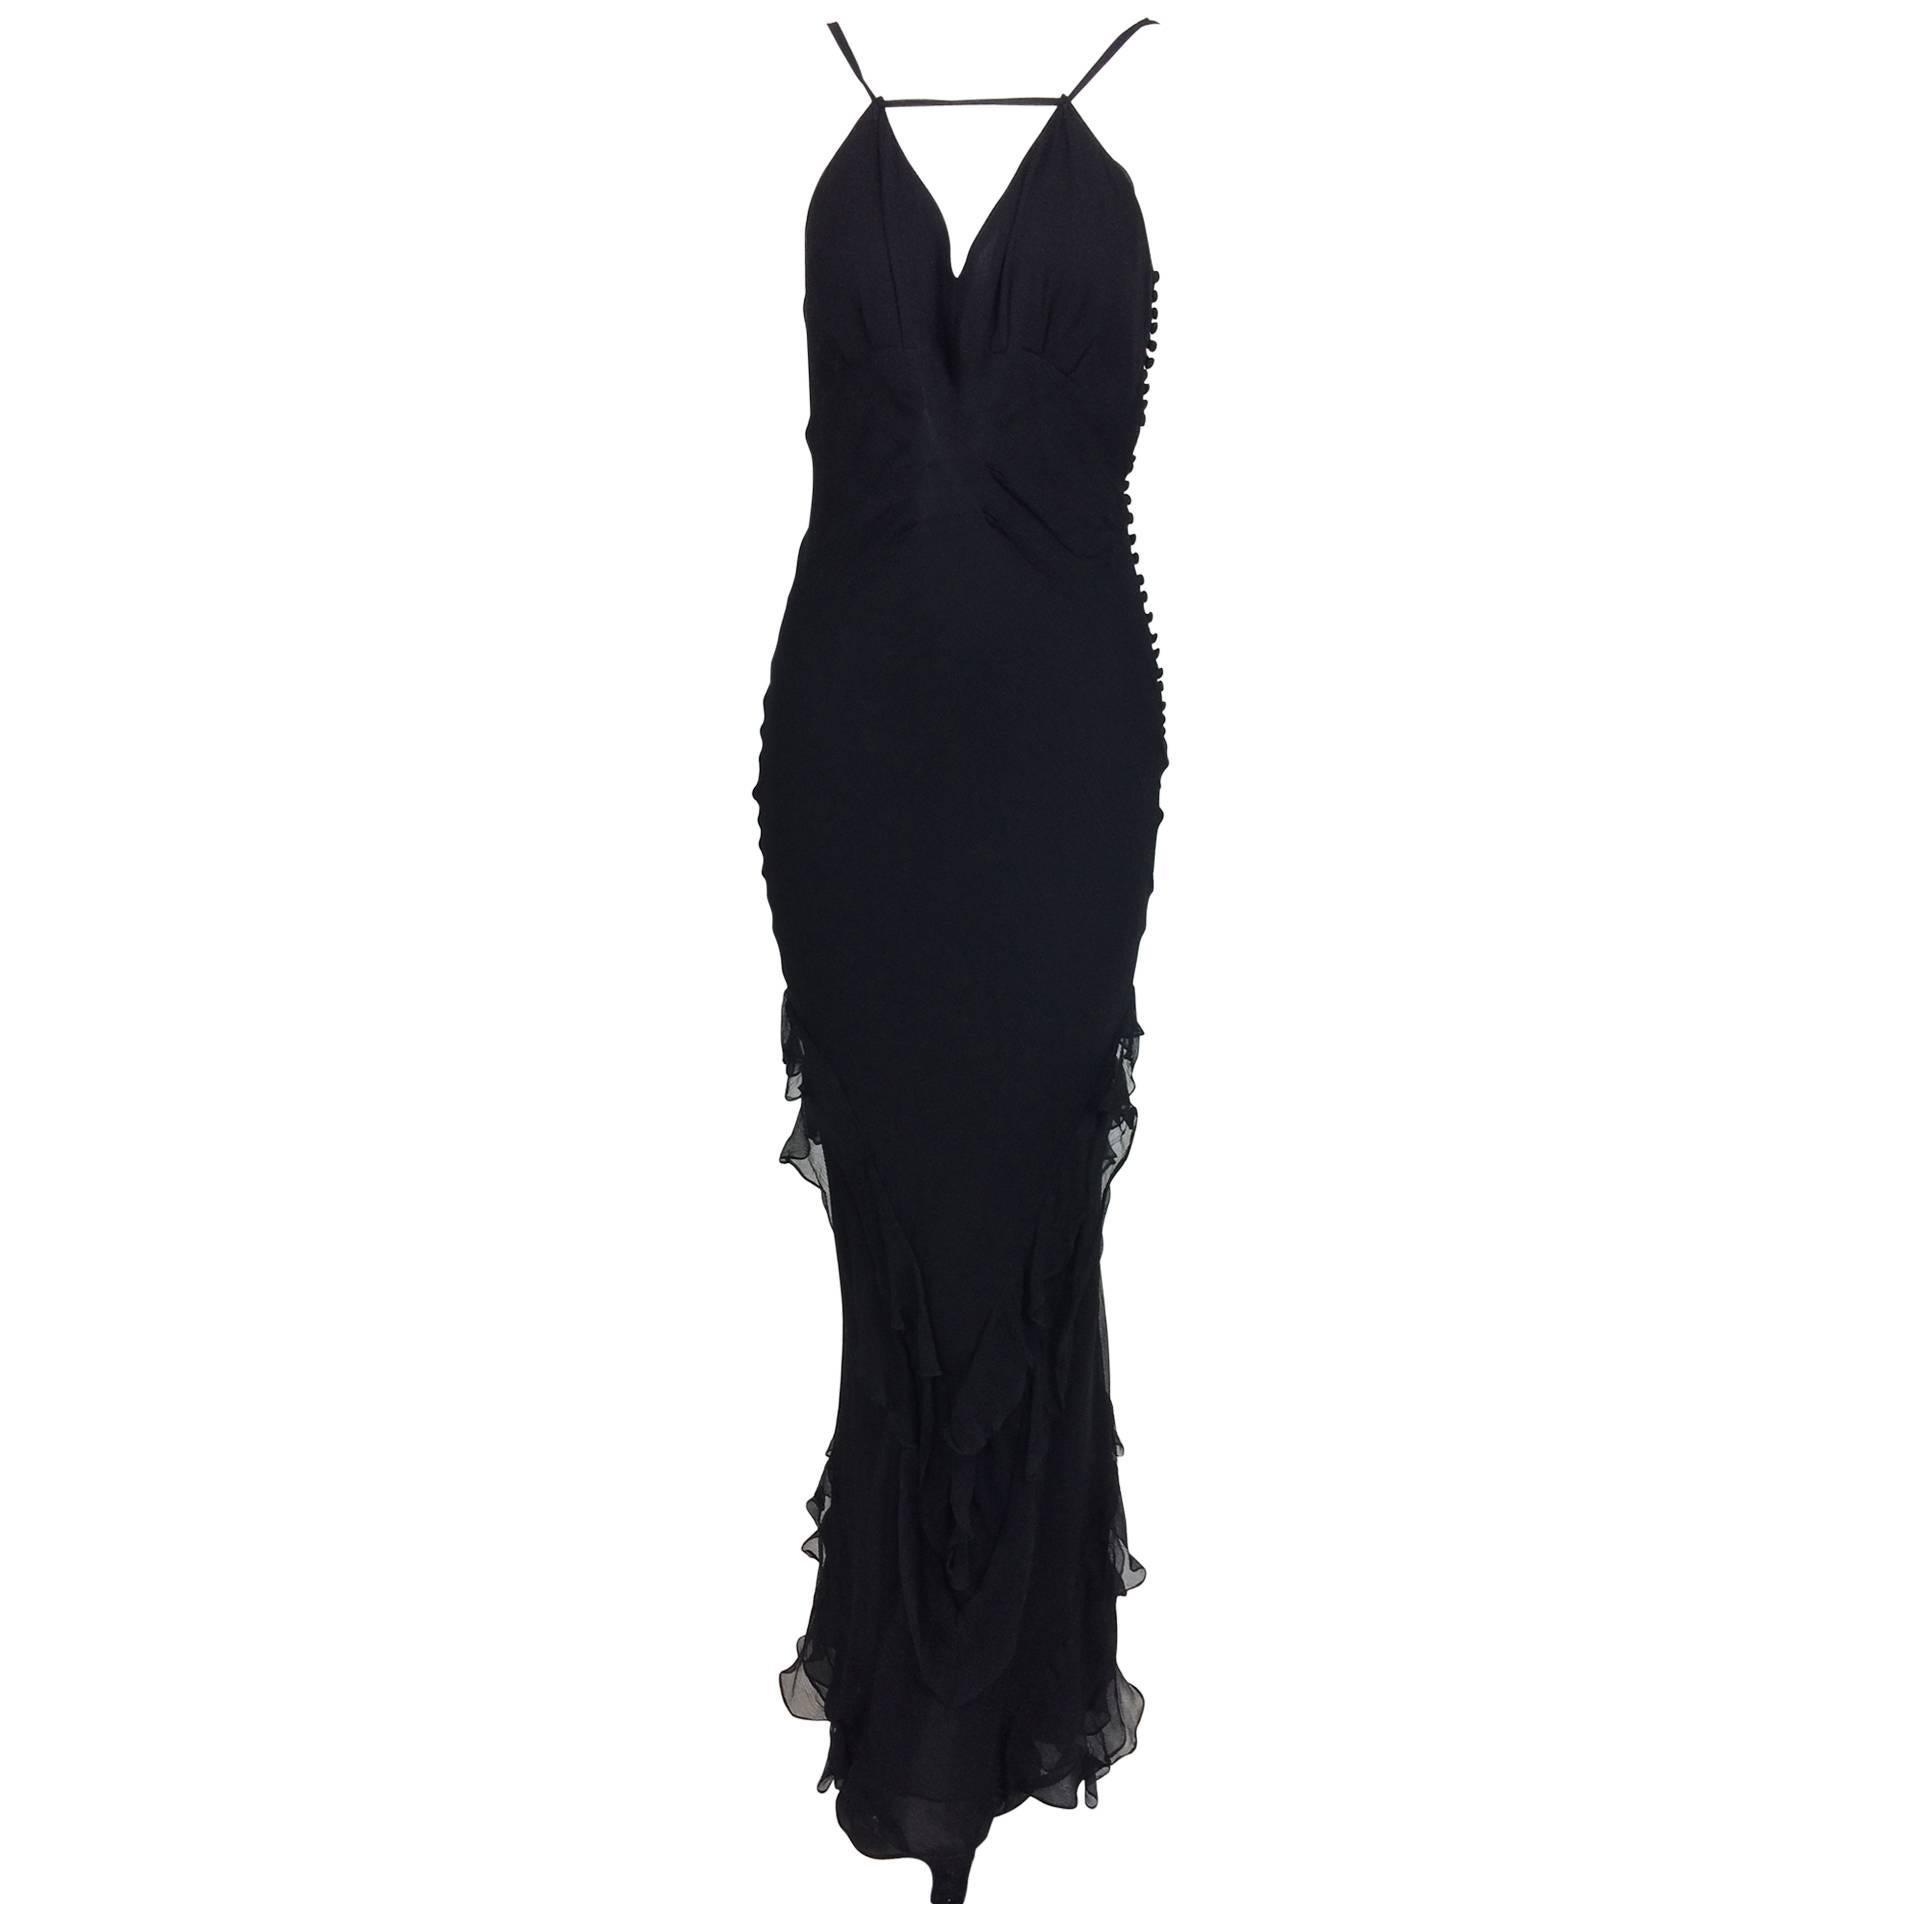 J. Mendel halter neck black tiered ruffle chiffon evening dress 8